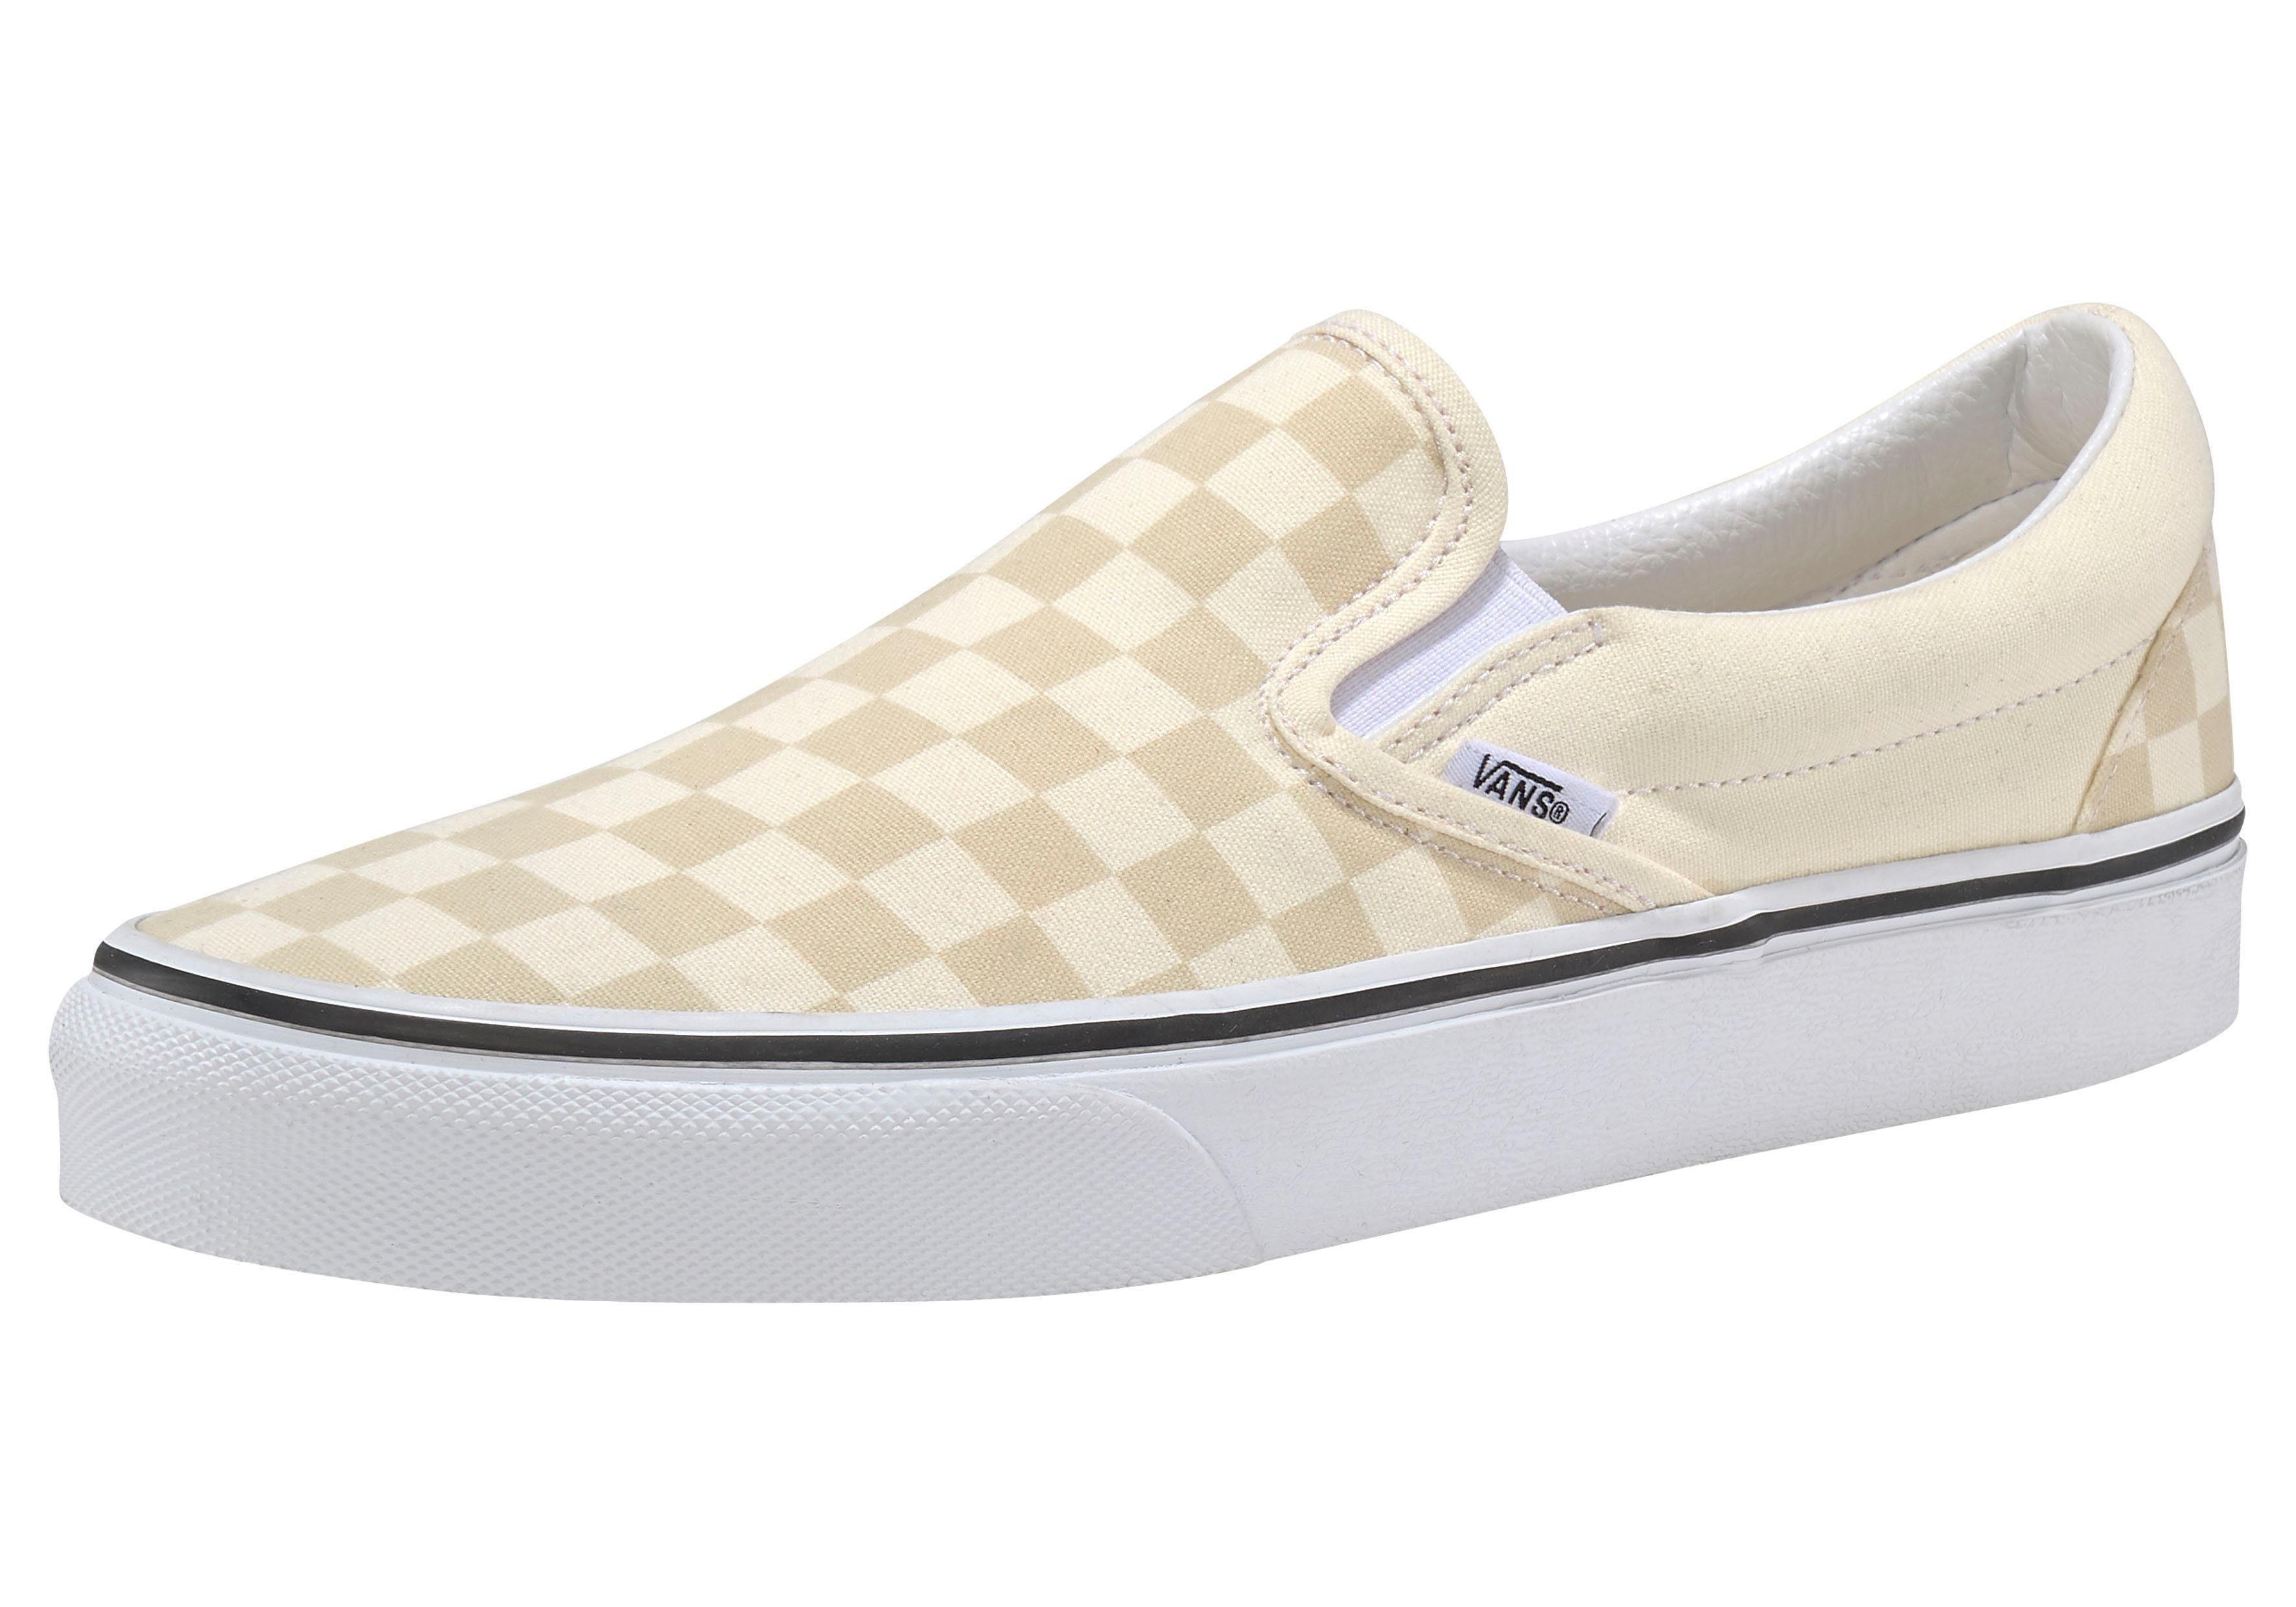 Vans »Checkerboard Classic Slip On« Sneaker kaufen | OTTO